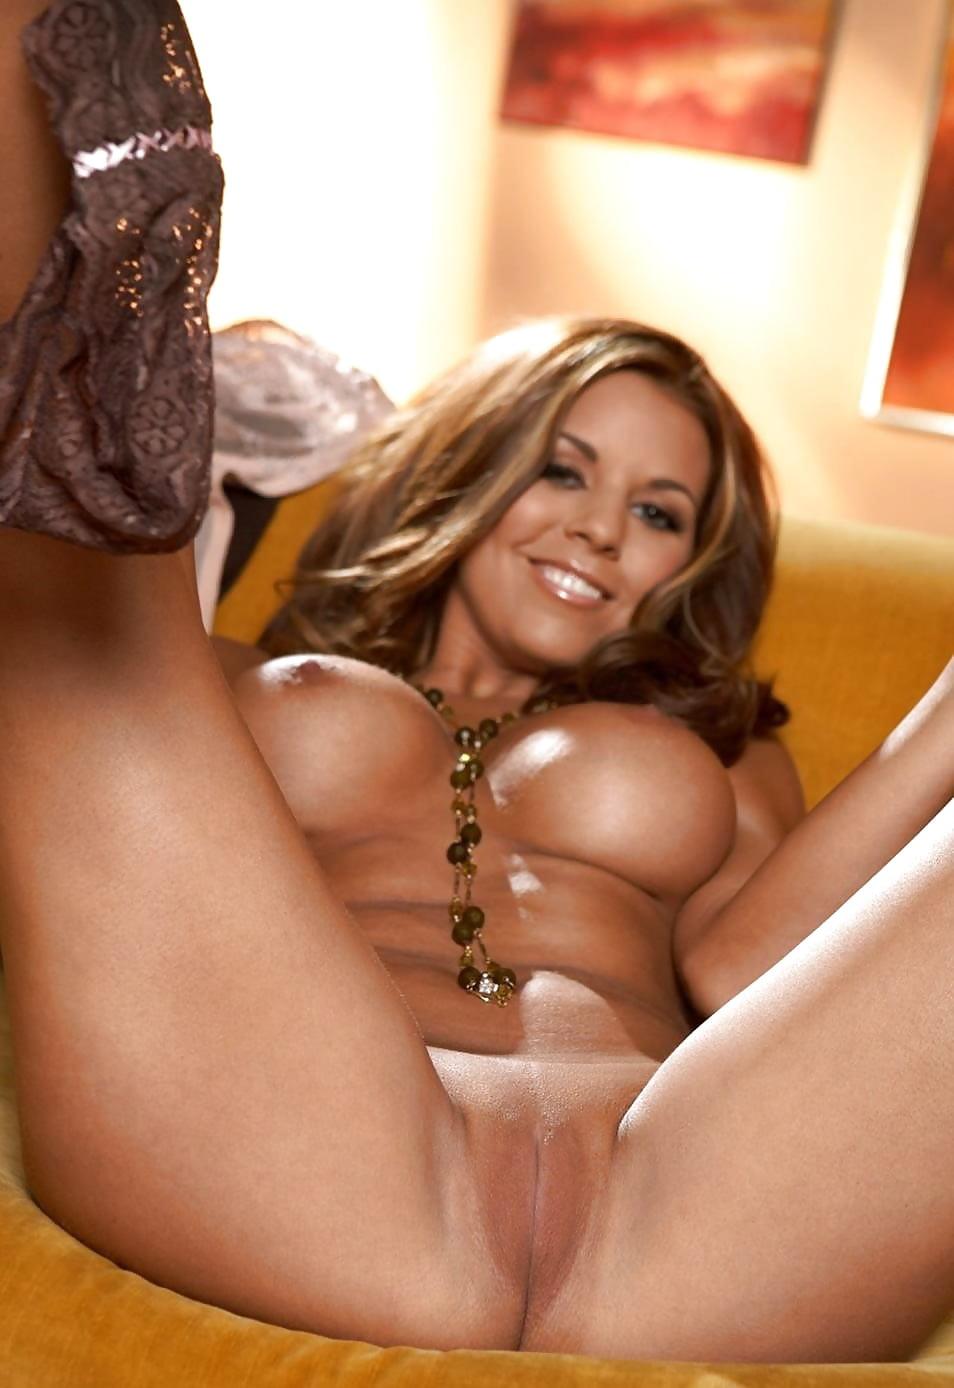 Sexy girls boobs hot-8128